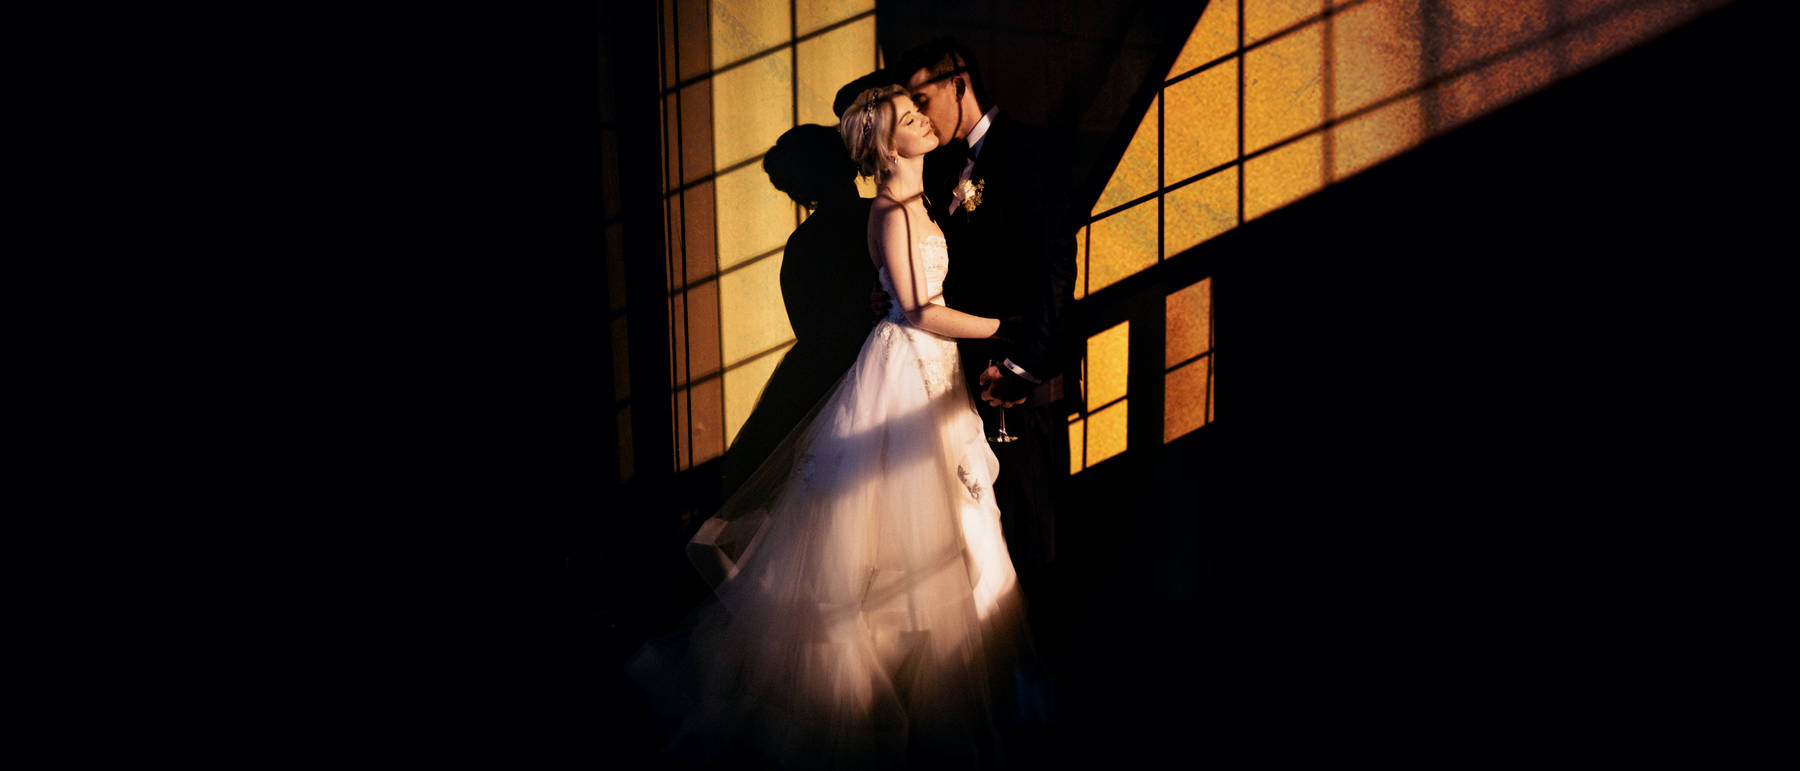 johnandjoseph-wedding-photographer-hz-slider-188